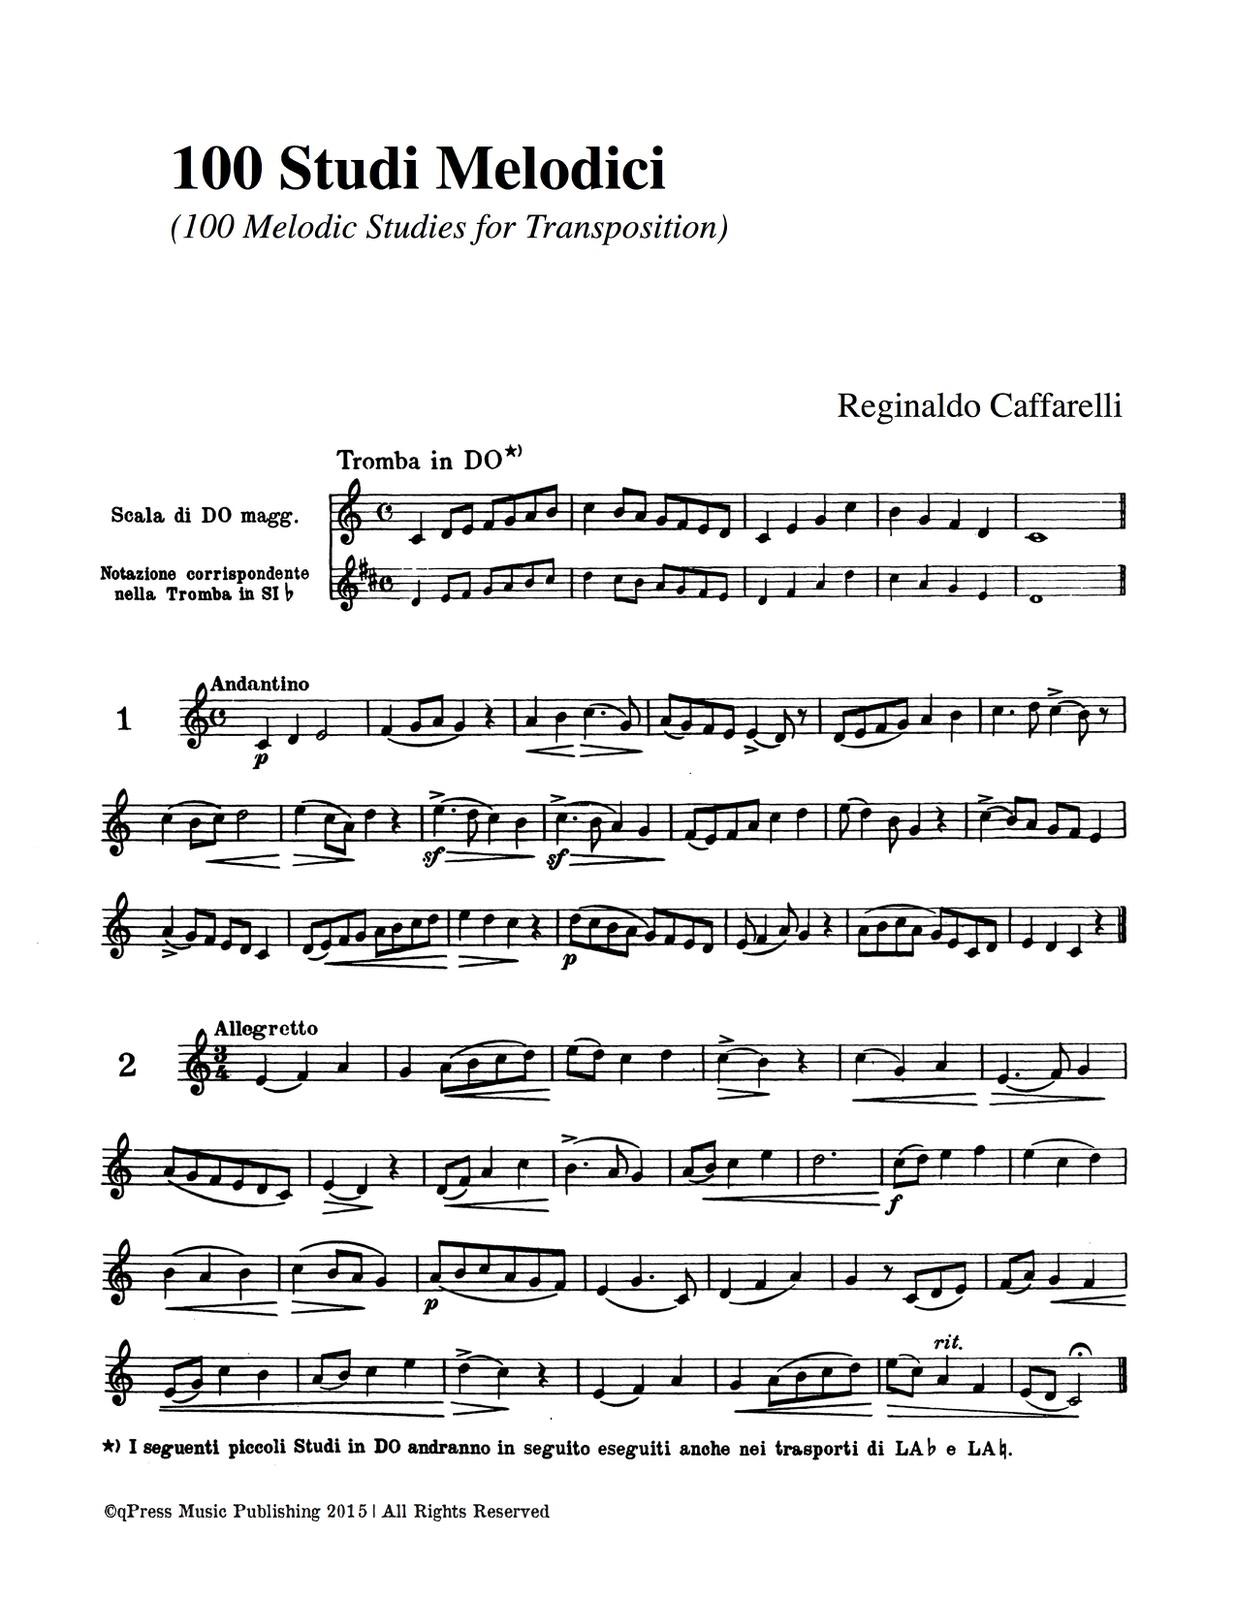 Caffarelli, 100 Studi Melodici-p09